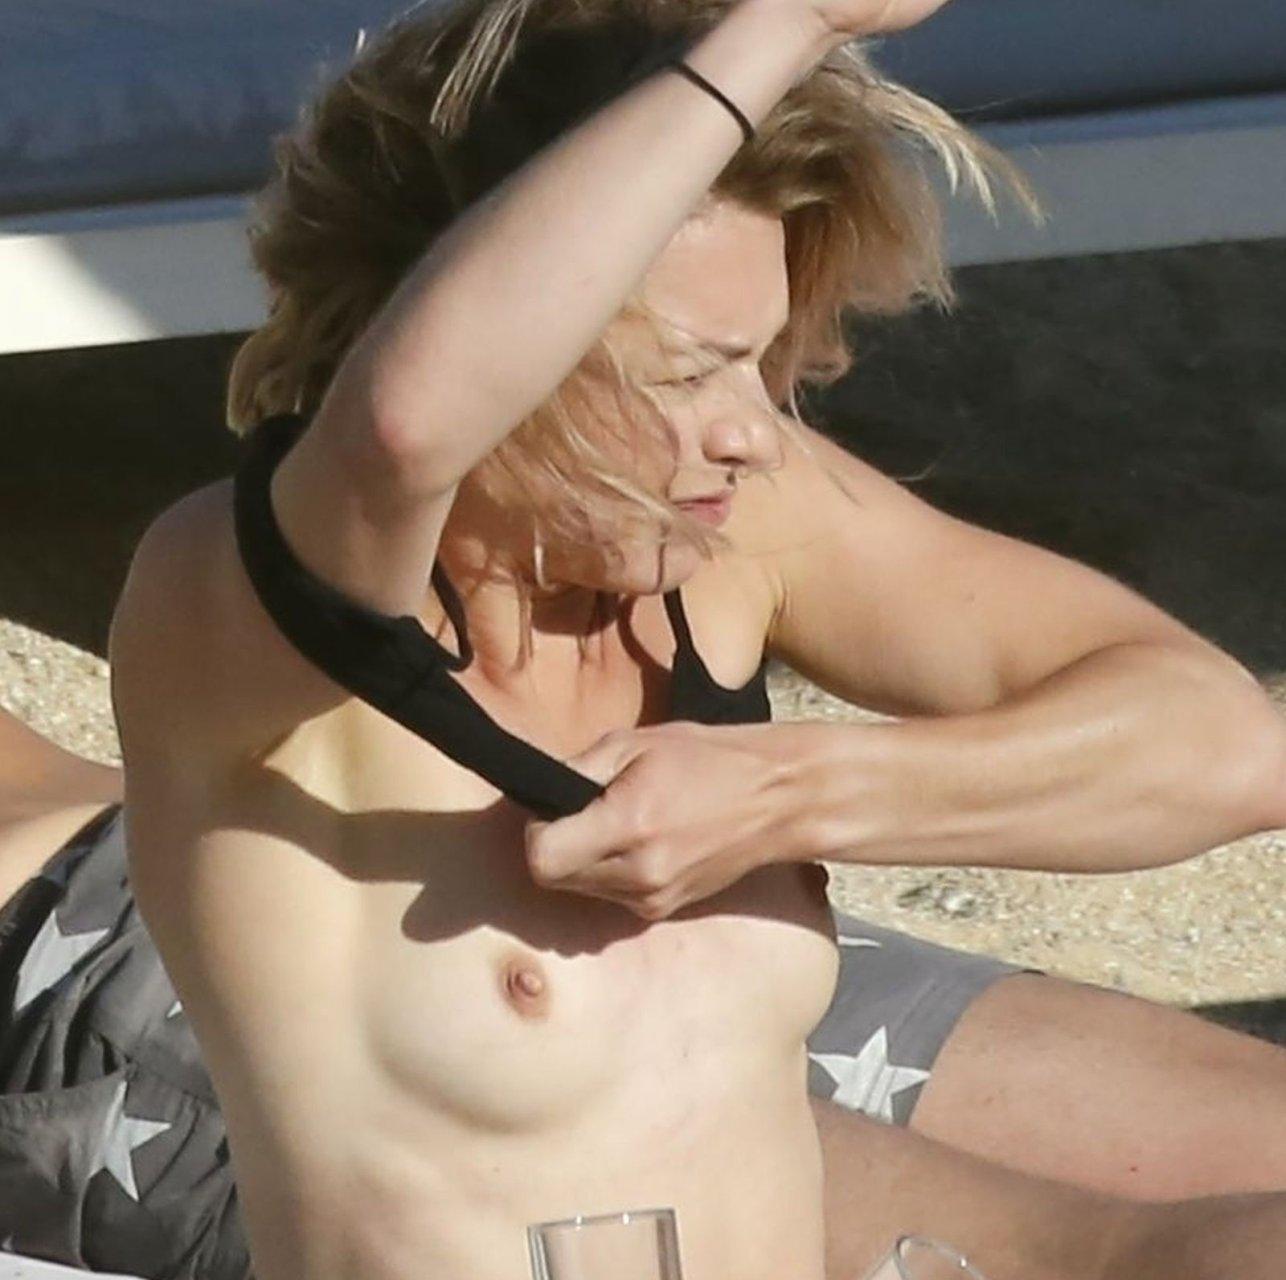 Stephanie-Pratt-Sexy-Topless-TheFappeningBlog.com-10.jpg